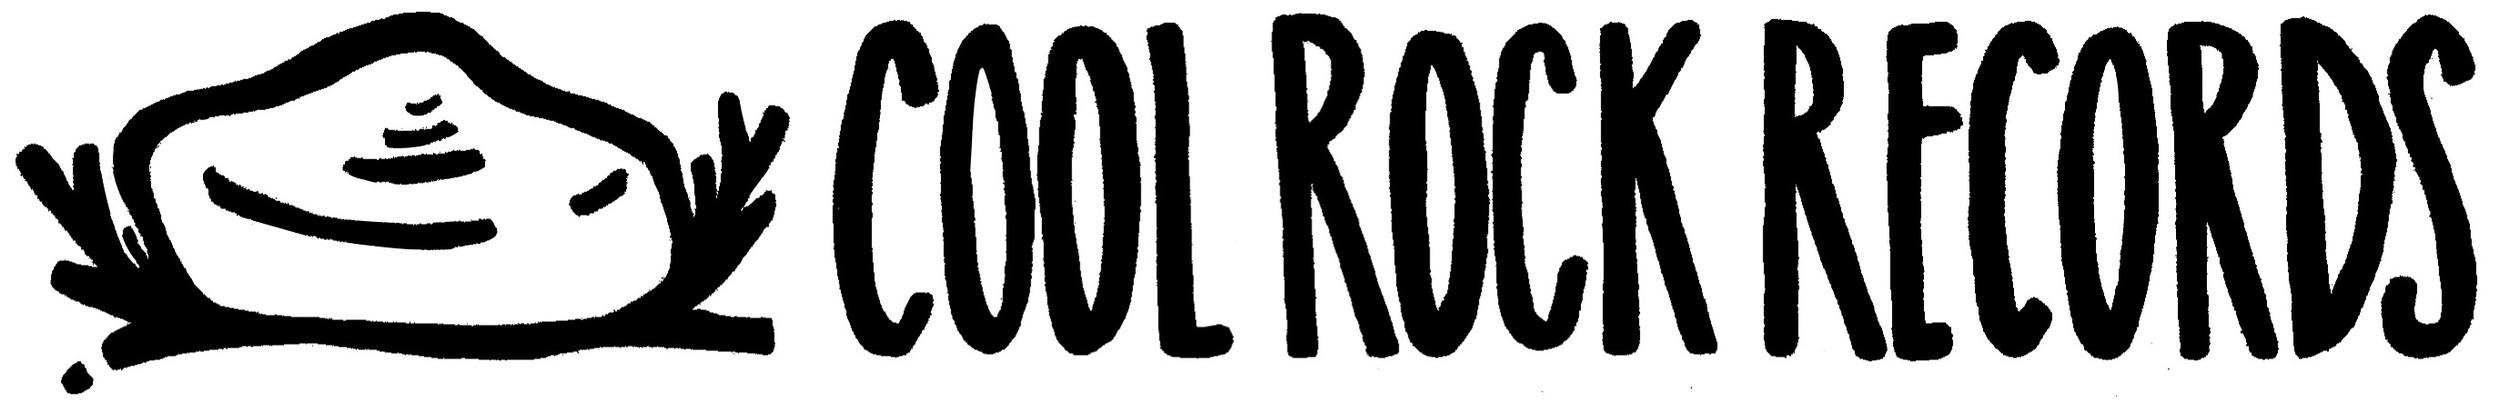 LOGO FOR JOHN DOE'S COOL ROCK RECORDS